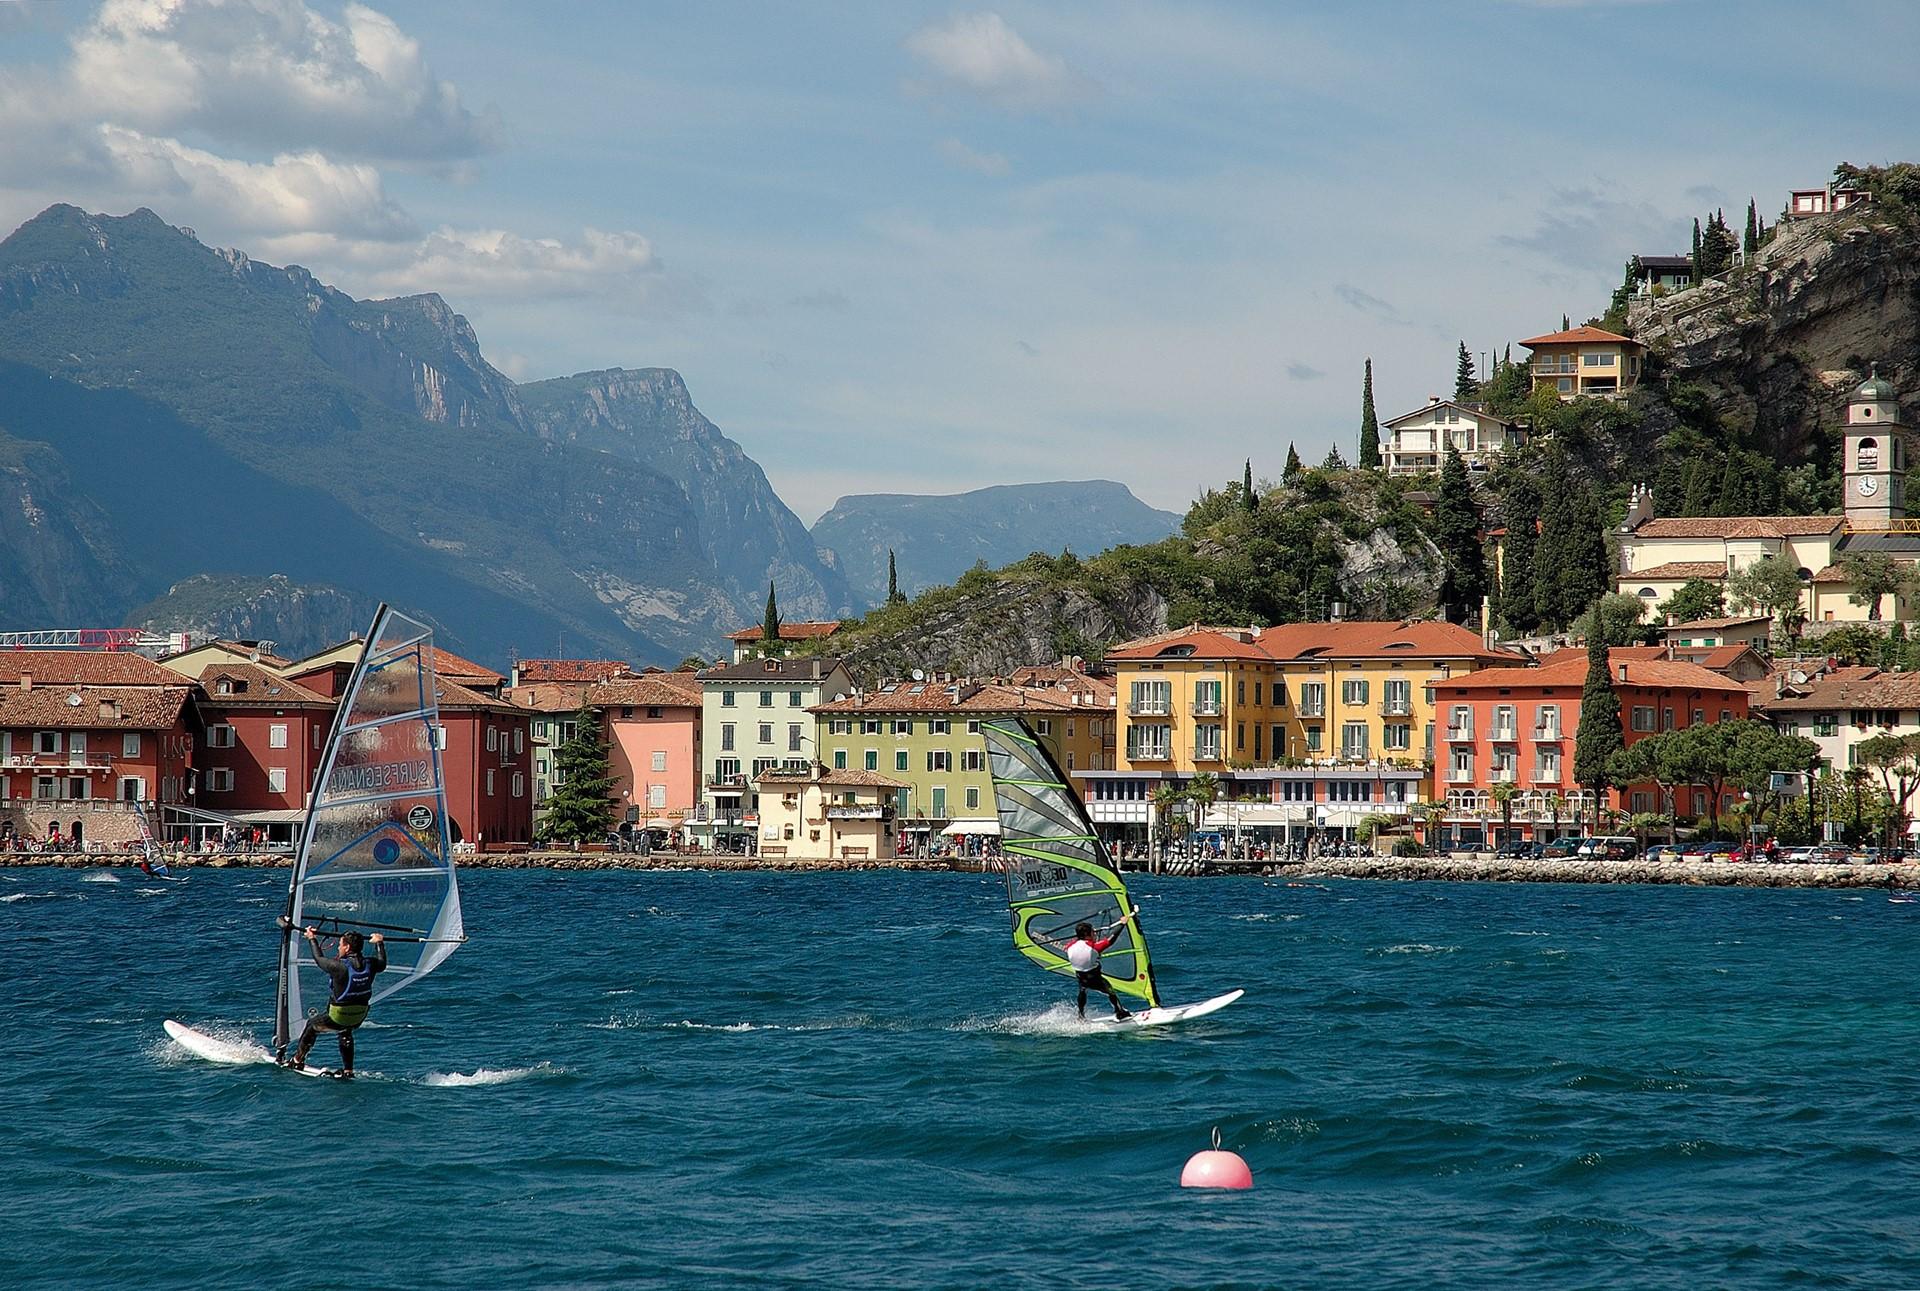 Holiday villas in Italy